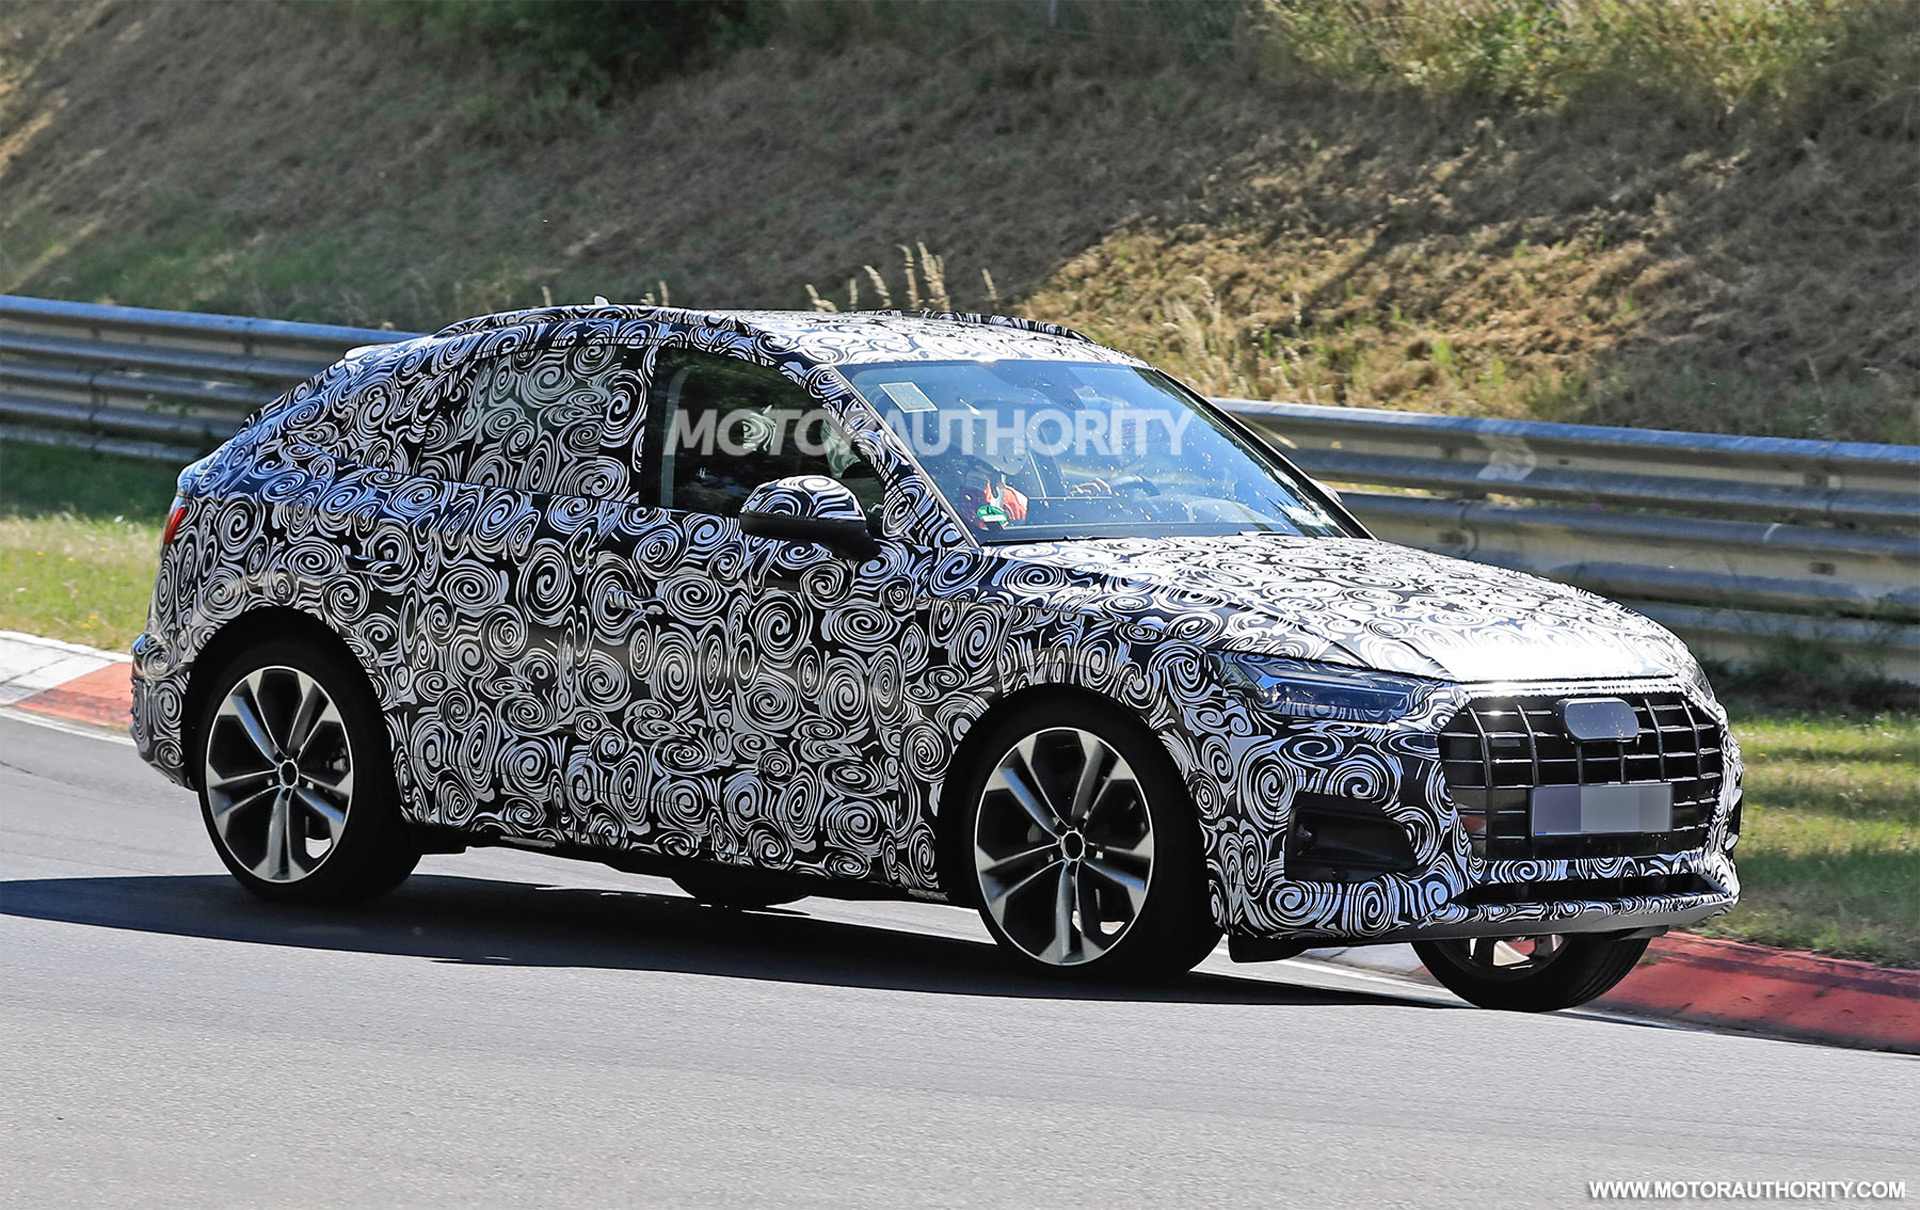 2020 - [Audi] Q5 Sportback - Page 7 2021-audi-q5-sportback-spy-shots--picture-credits-baldauf-sb-medien_100753279_h